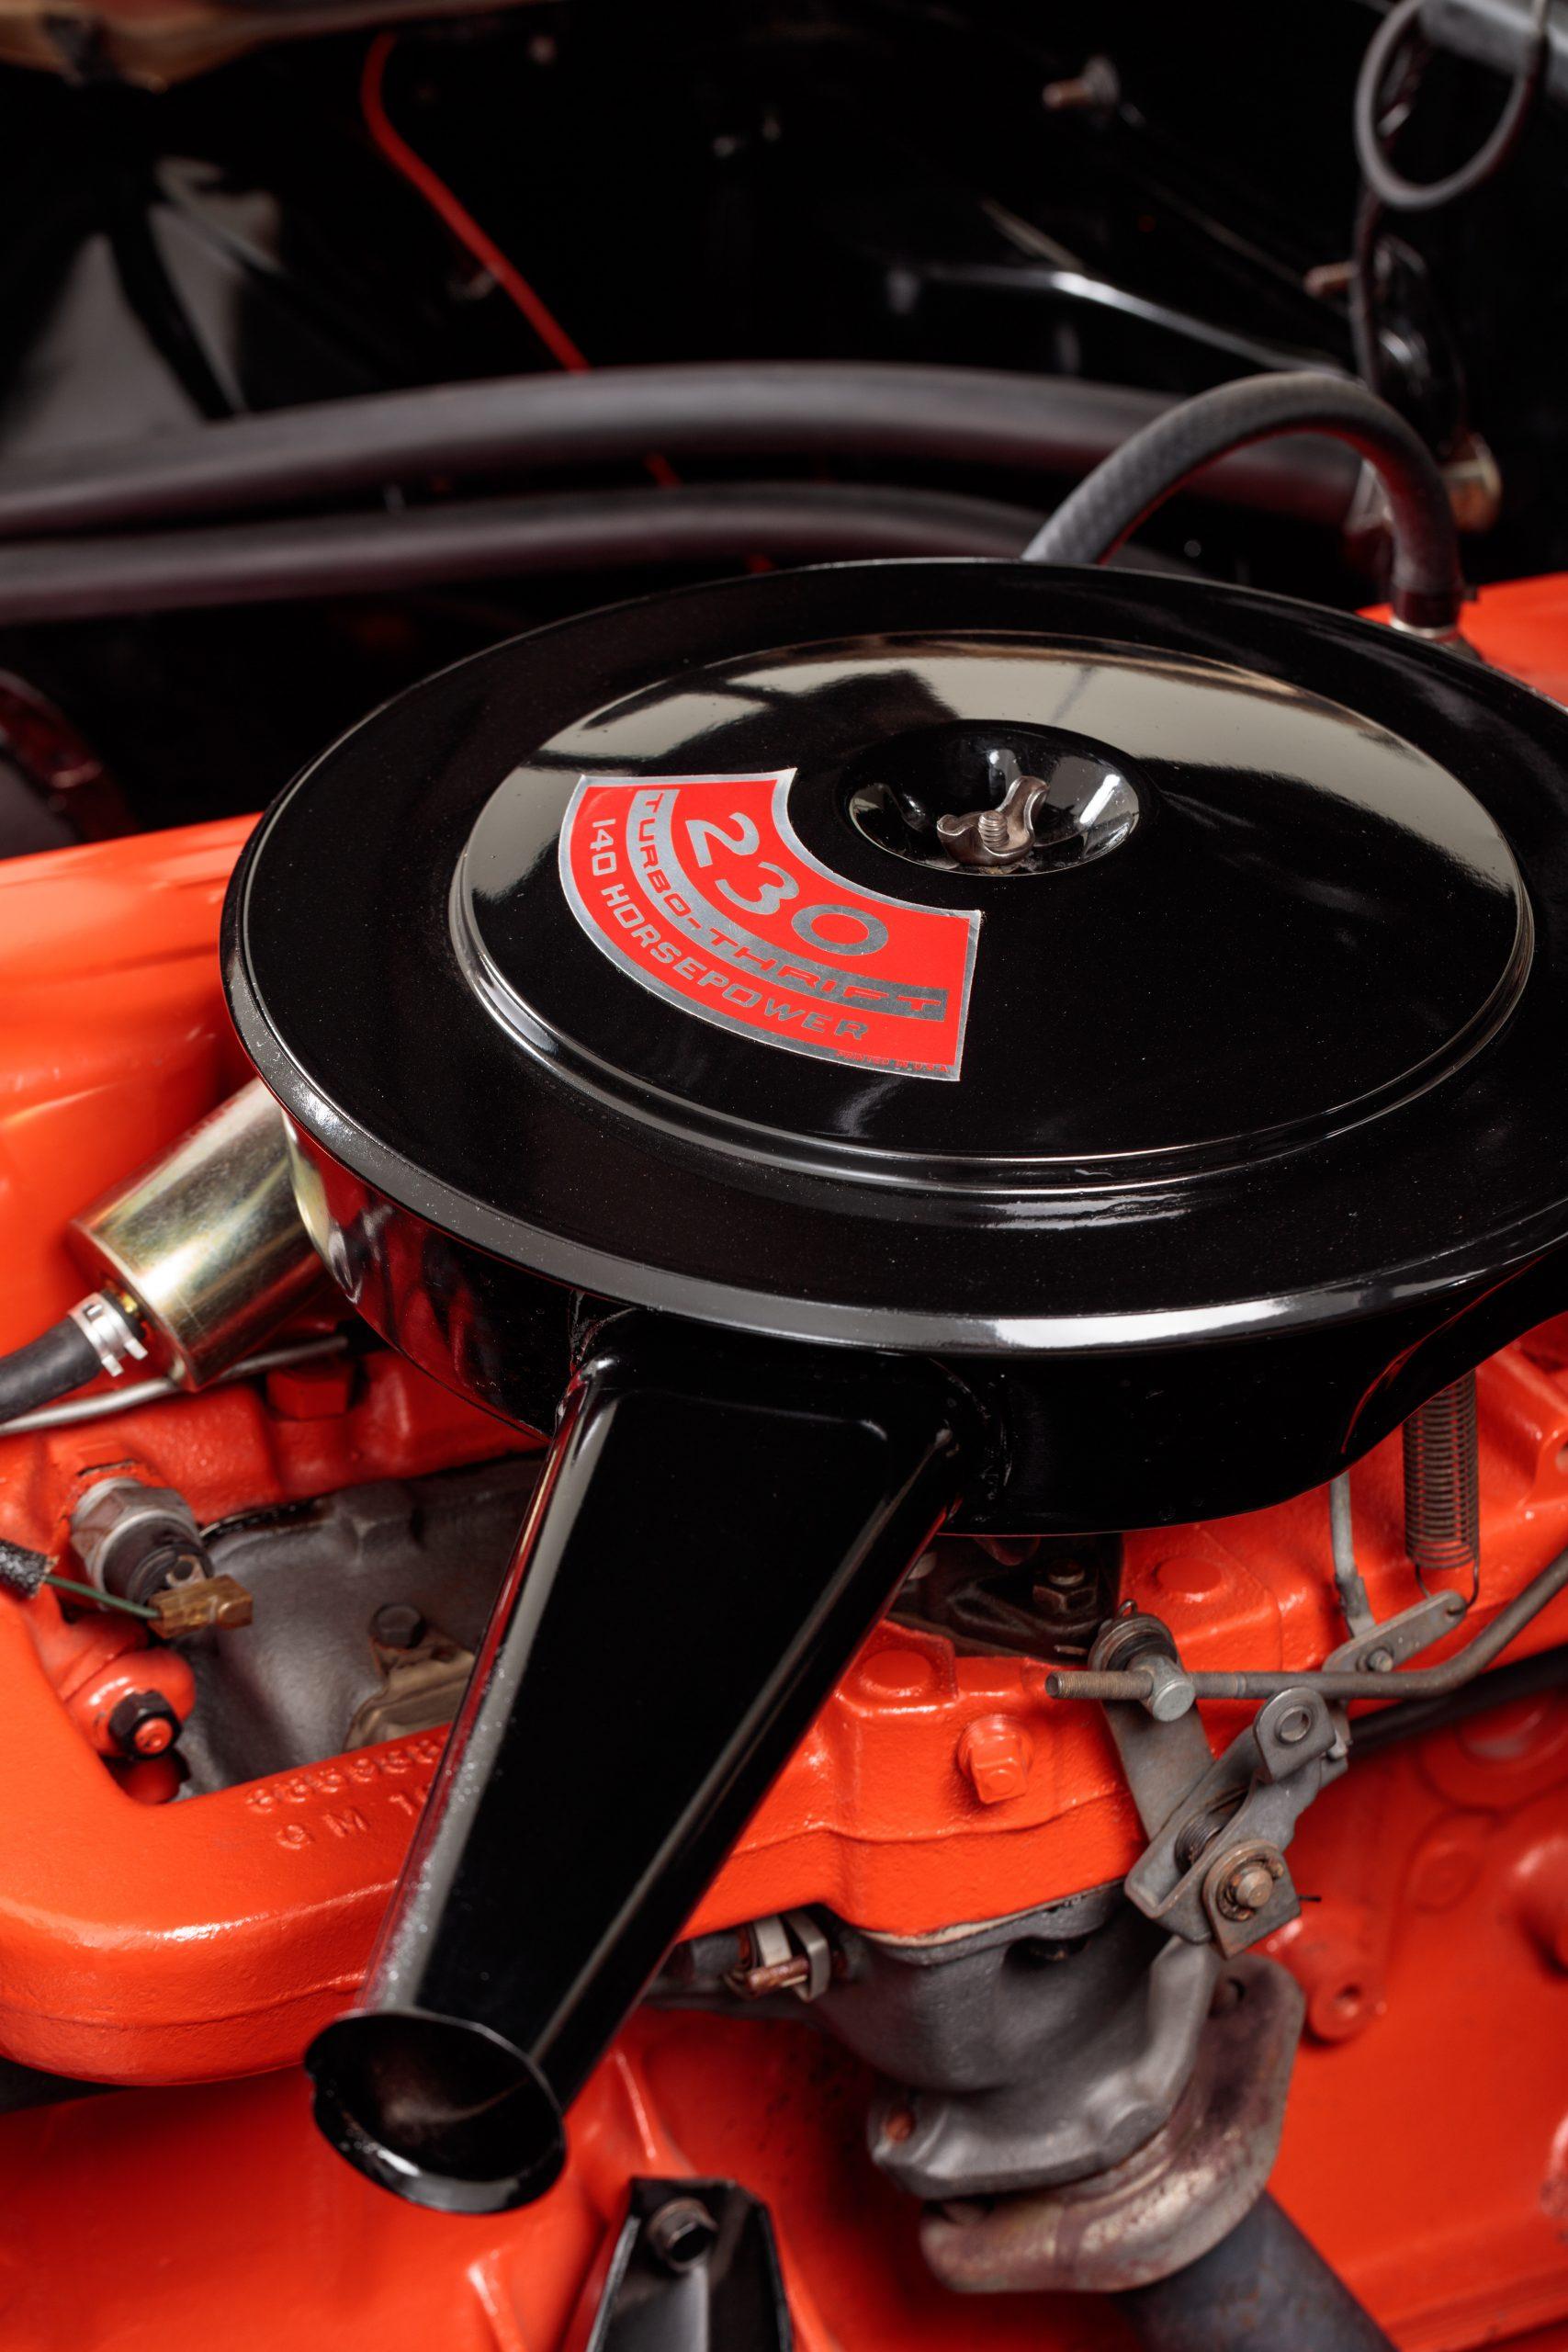 HVA - Chevrolet Camaro N100001 - Closeup engine air filter